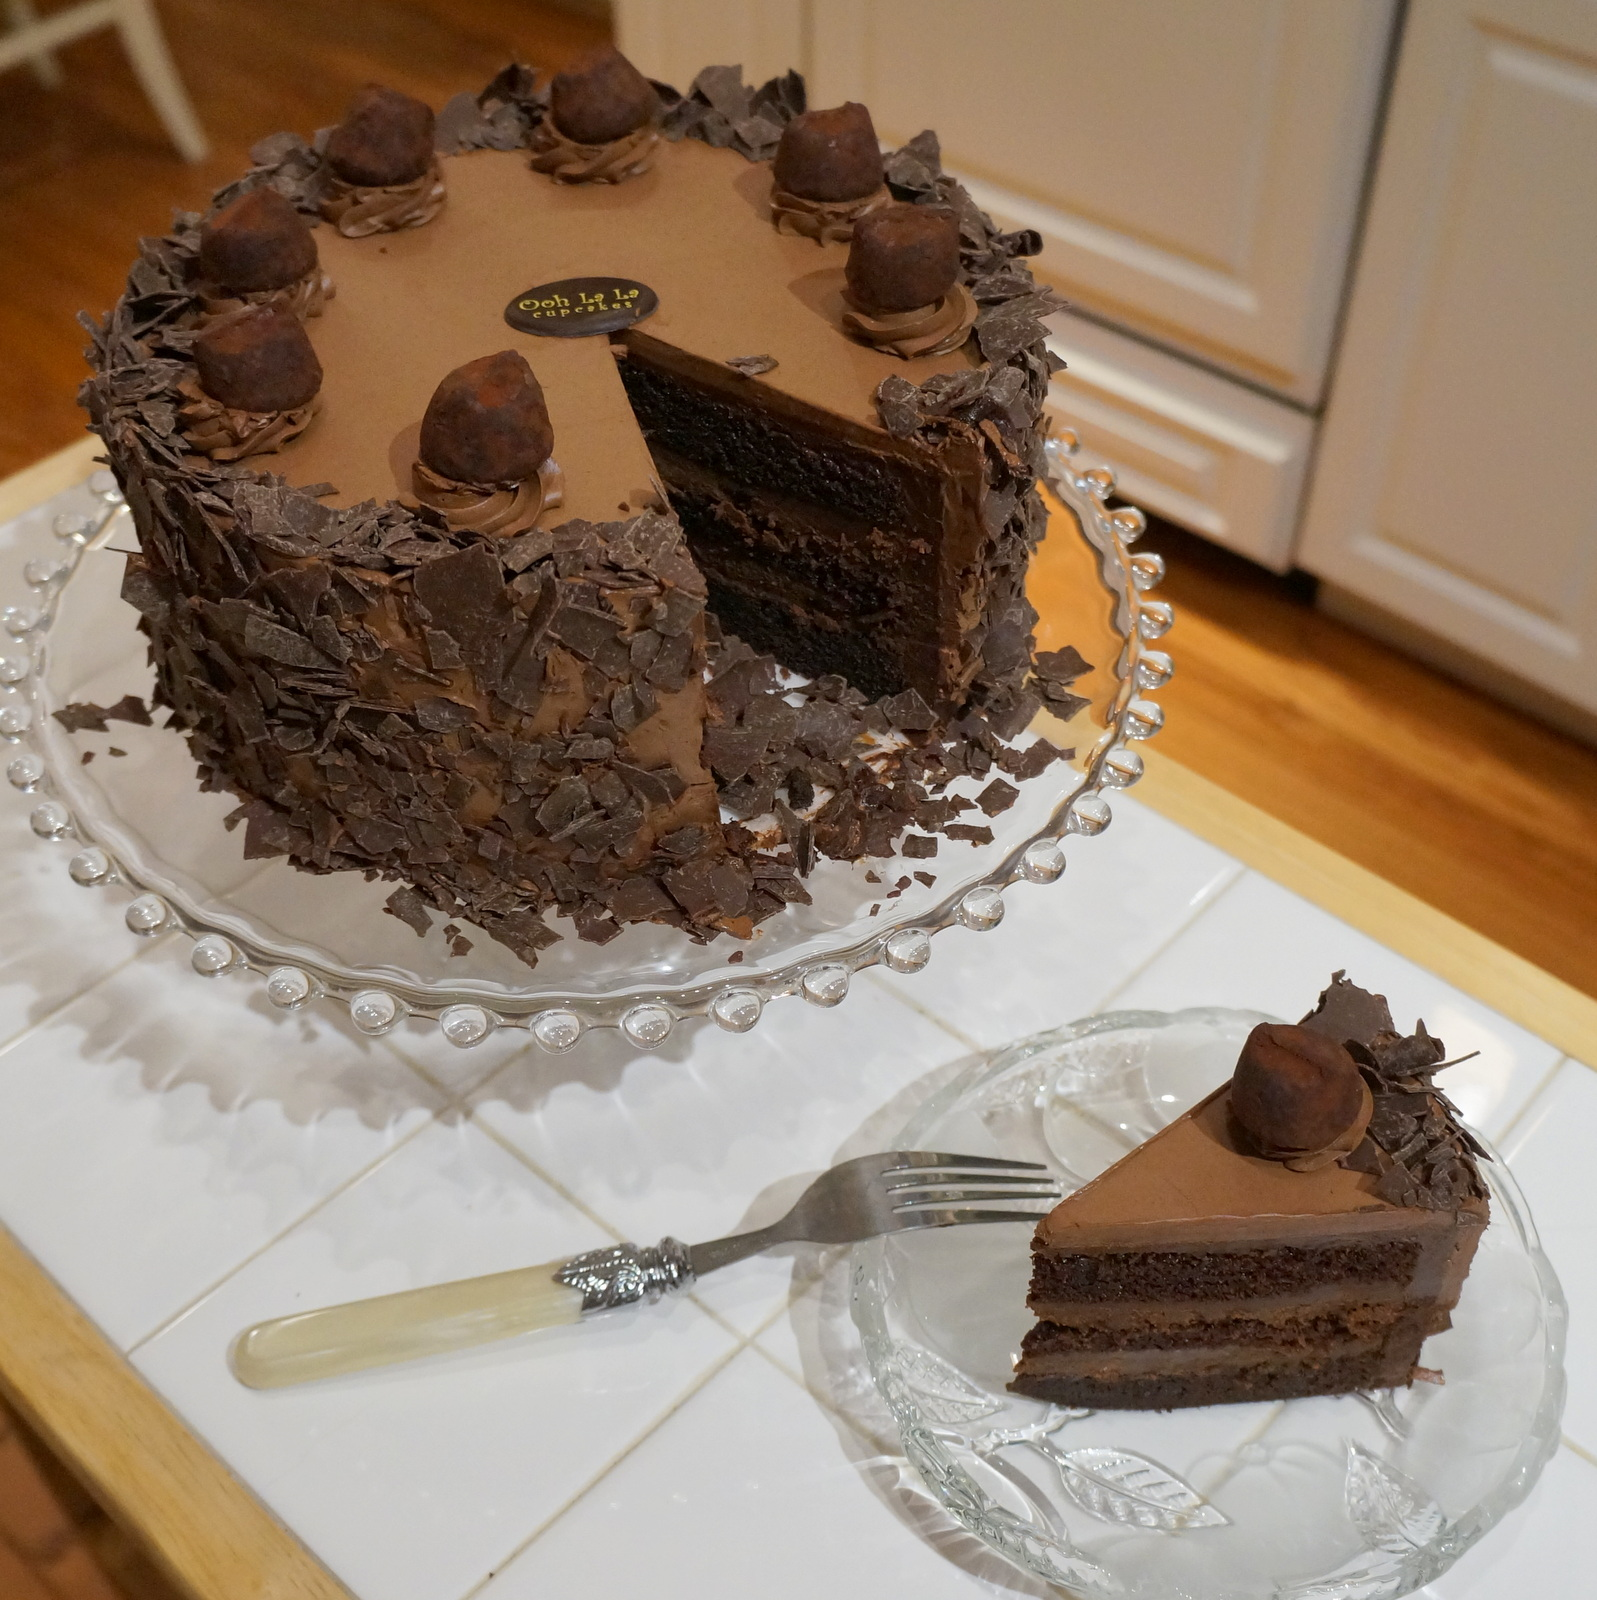 Chocolate Cake With Chocolate Ganache Filling